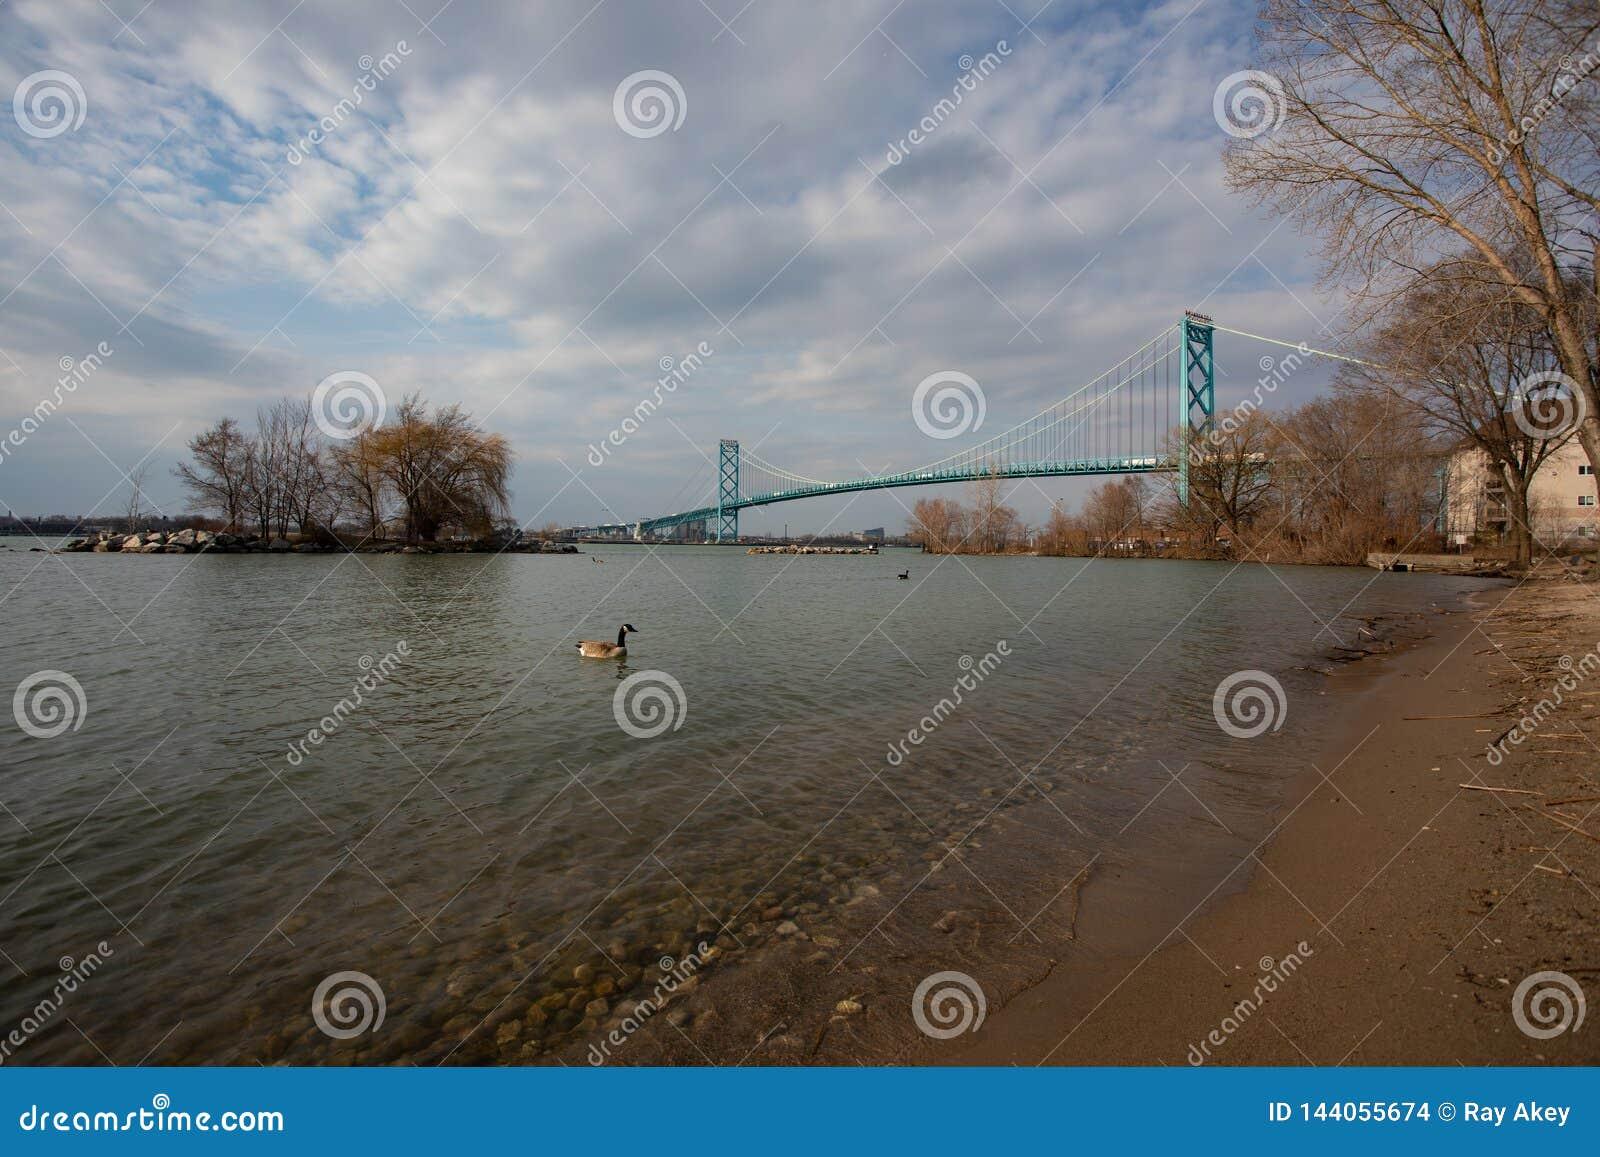 March 28 2019 Windsor Ontario Canada City Landscape McKee Park View Detroit River Michigan Crossing Ambassador Bridge Canada Goose Wallpaper